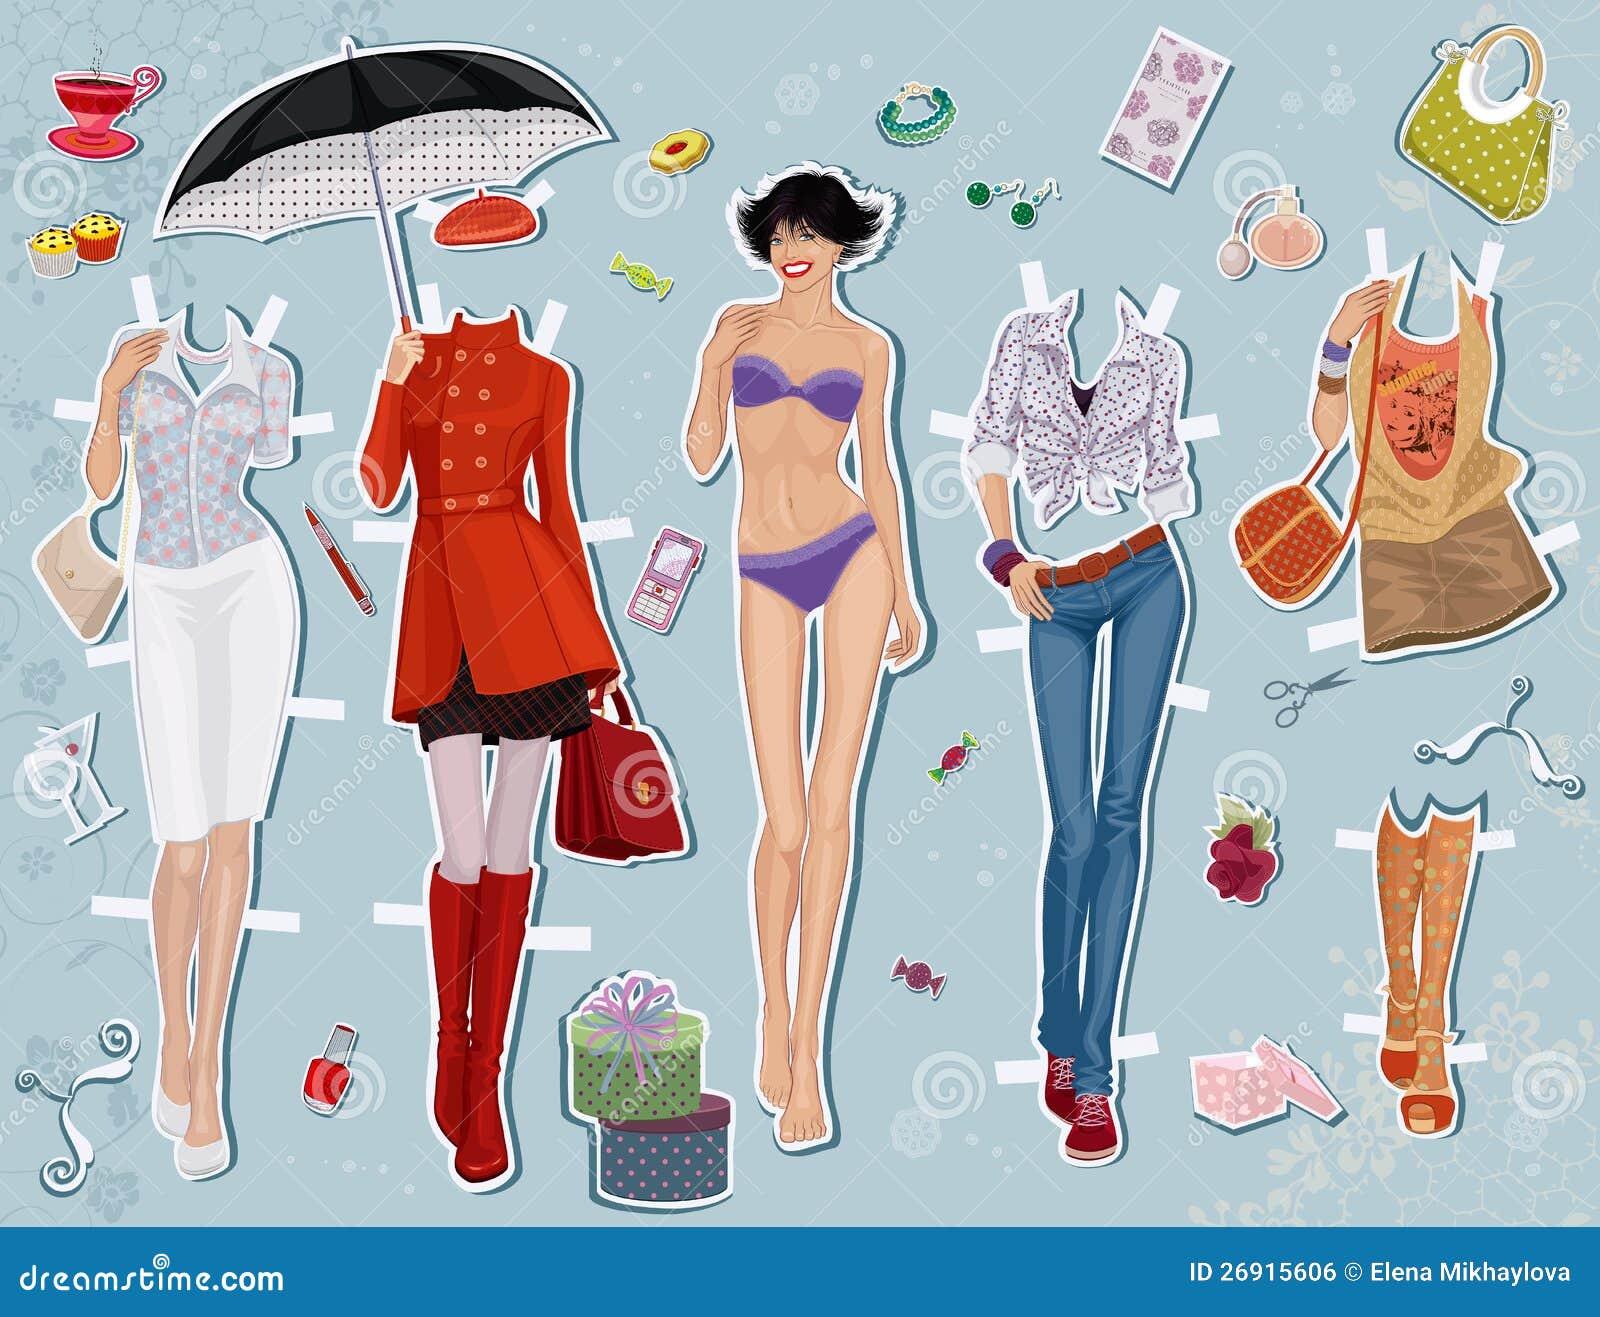 Free erotic paper dolls